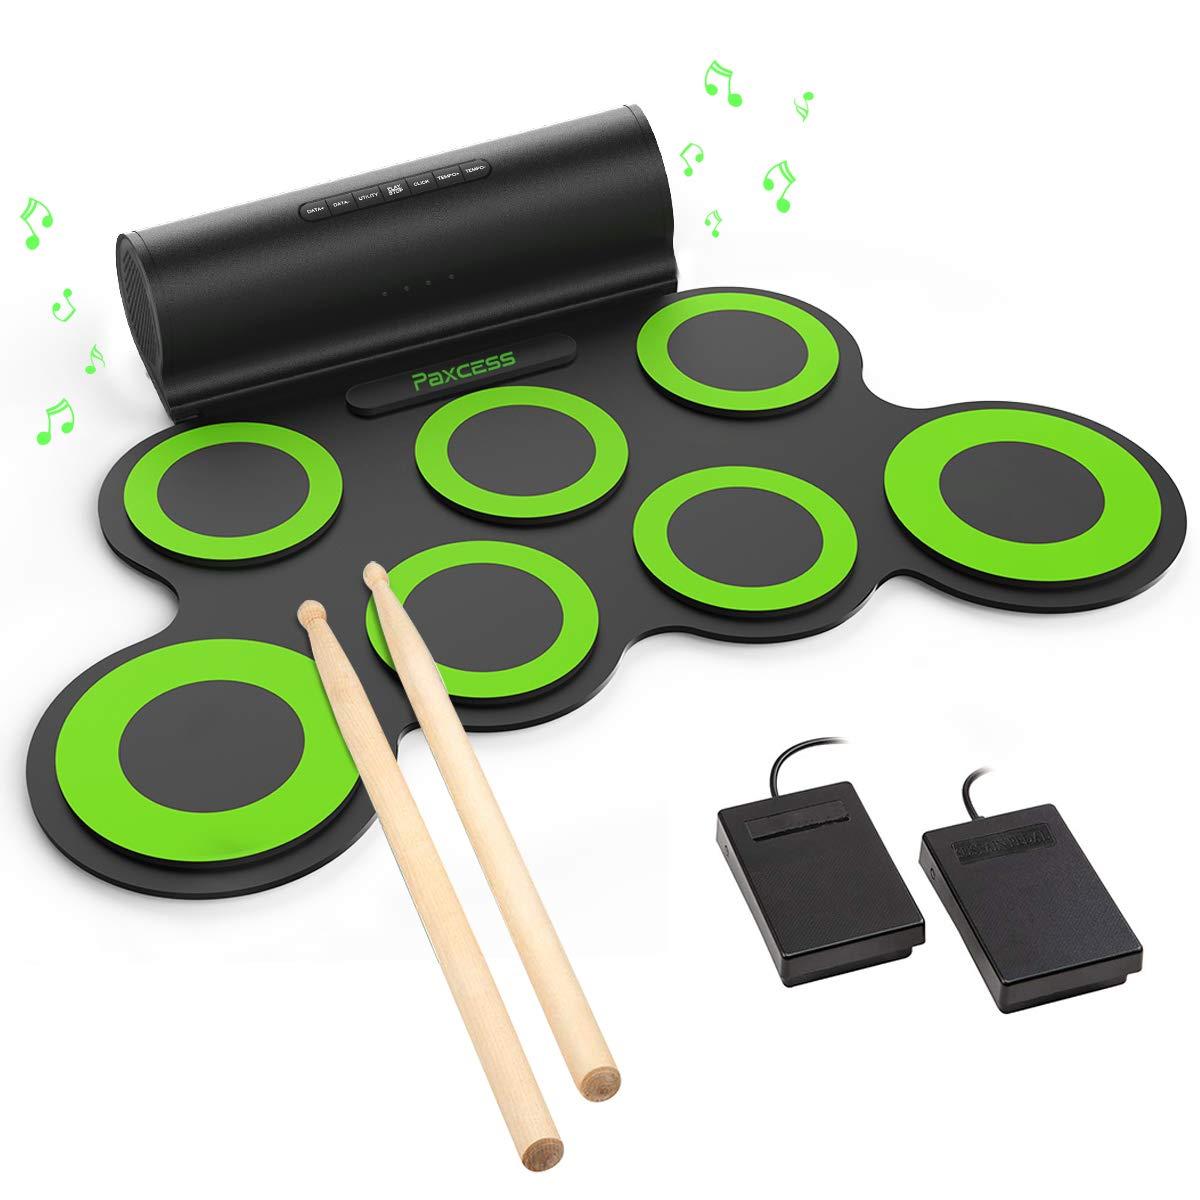 PAXCESS Electronic Drum Set, Roll Up Drum Practice Pad Midi Drum Kit with  Headphone Jack Built-in Speaker Drum Pedals Drum Sticks 10 Hours Playtime,